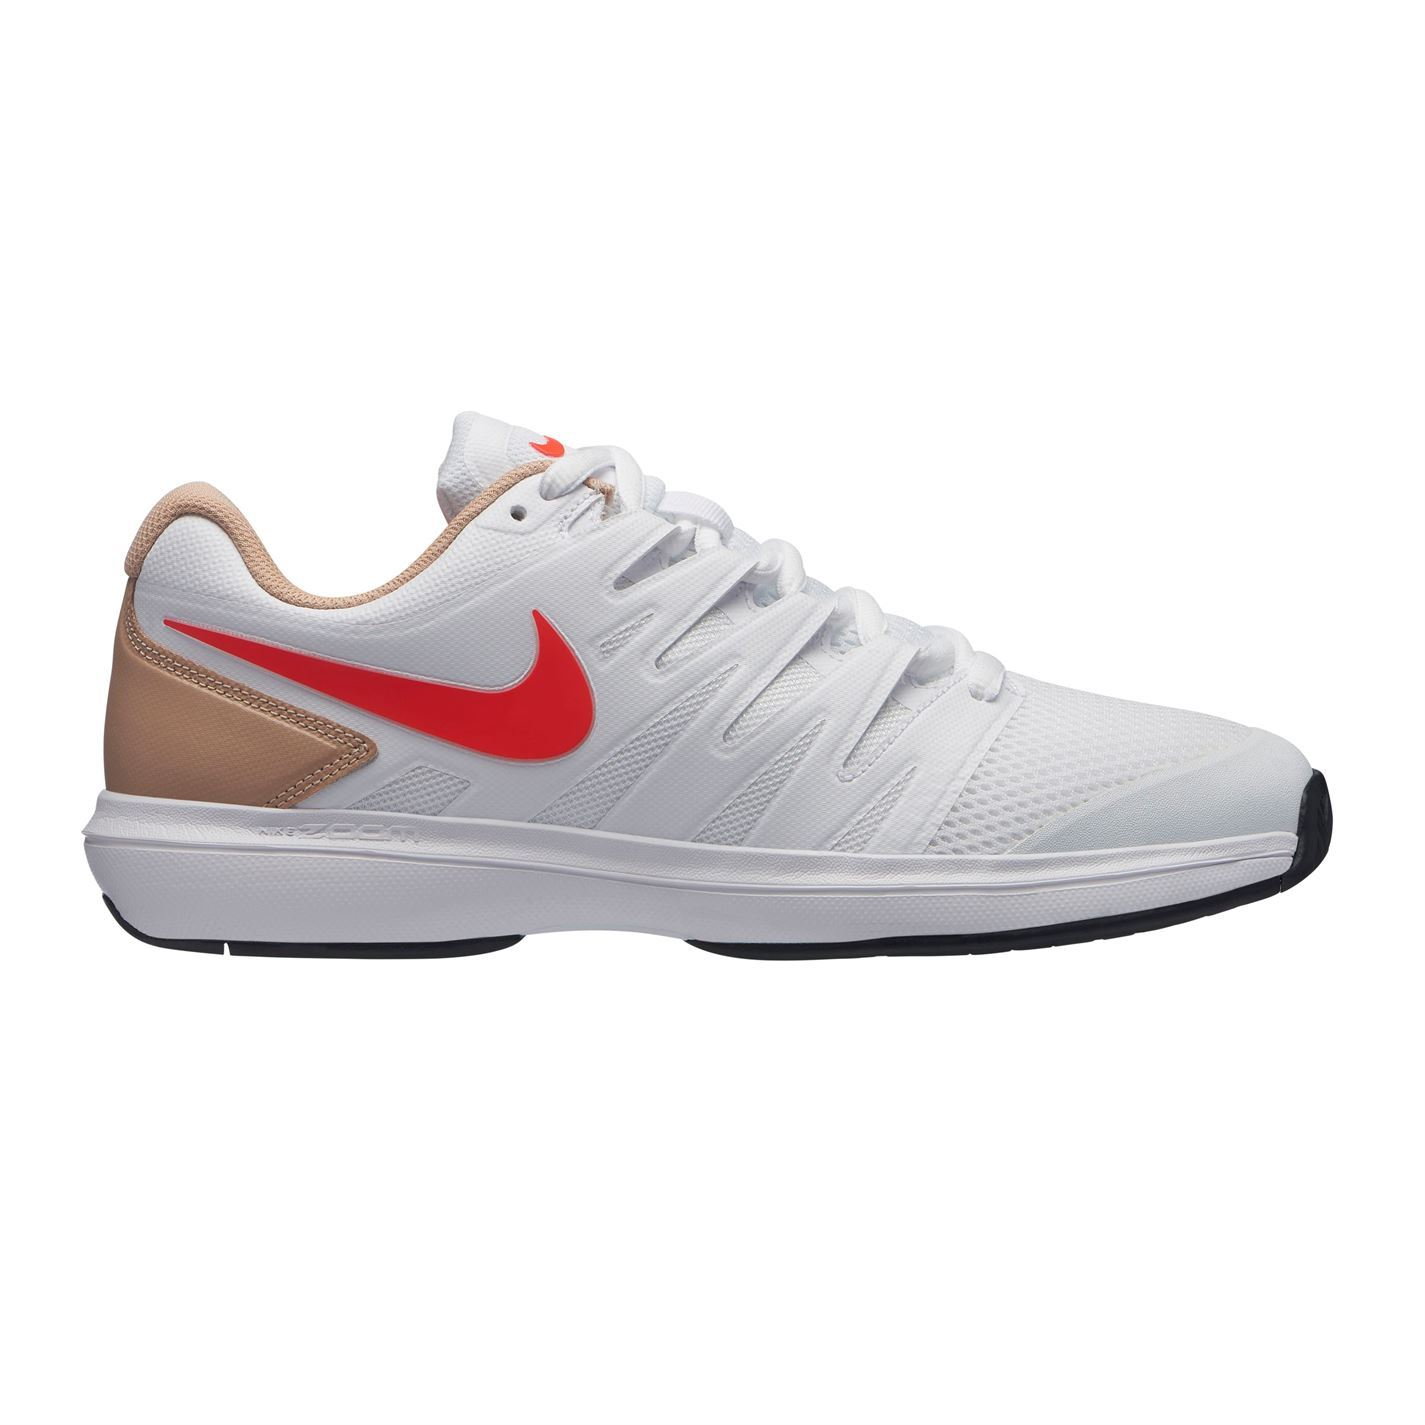 68c6f0486f Nike Air Zoom Prestige Tennis Shoes Mens Sports Footwear Trainers ...